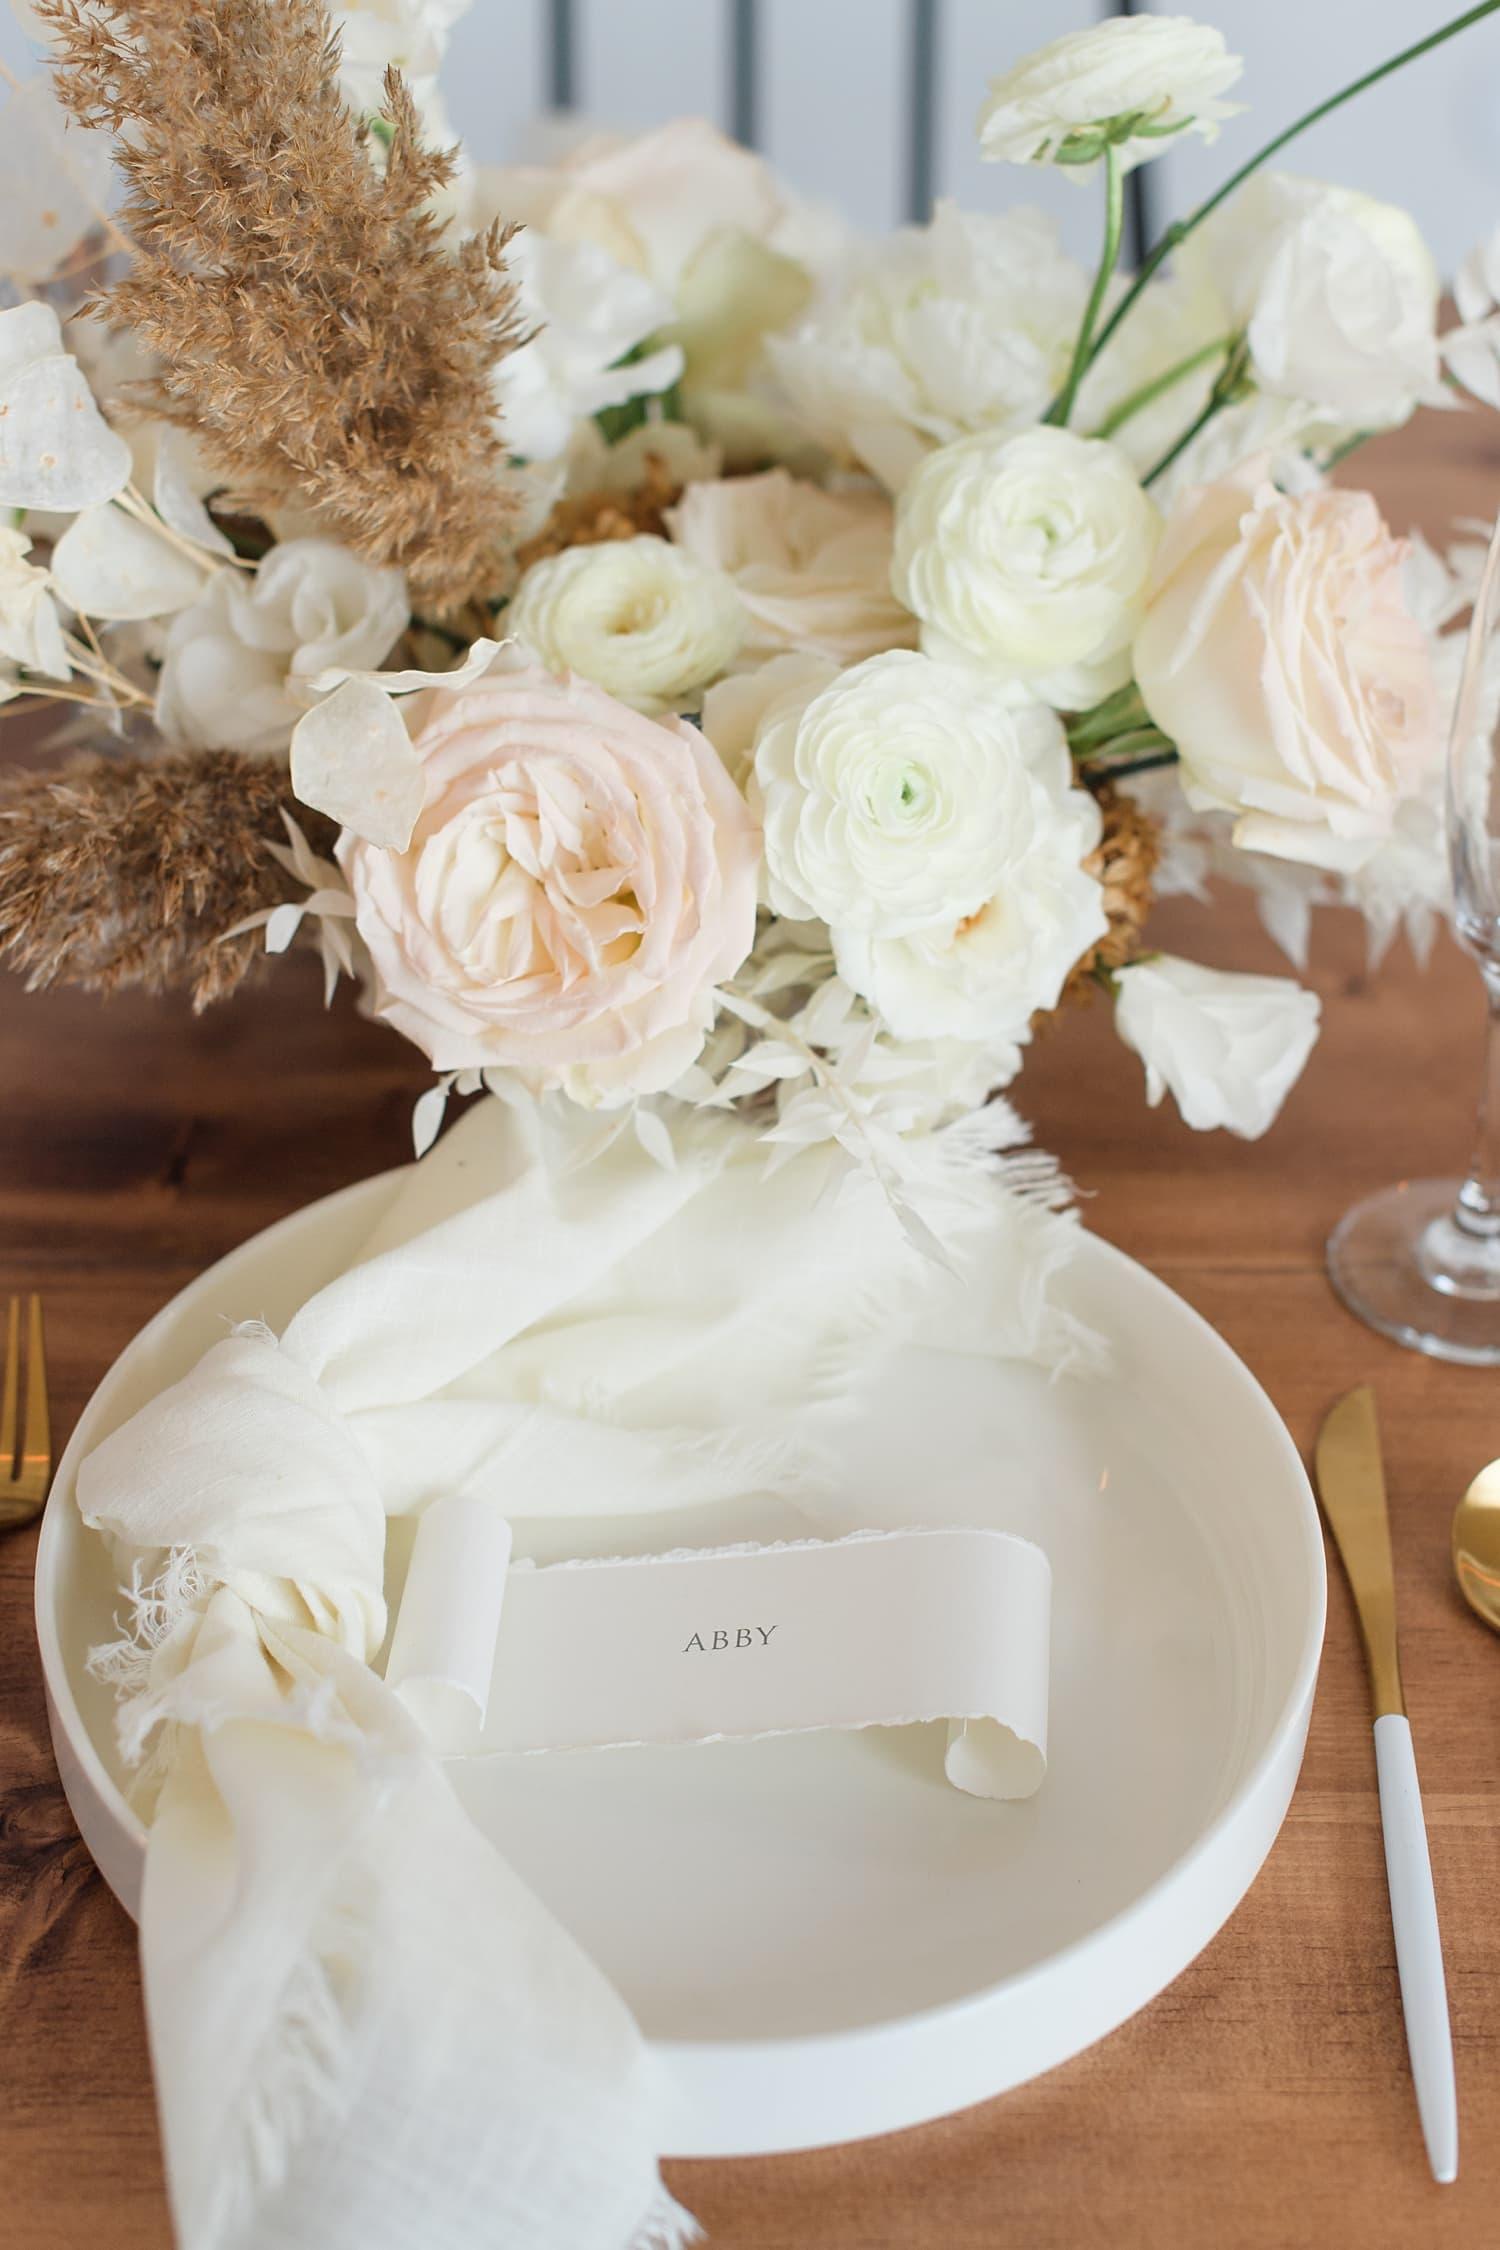 mod boho elegant wedding reception table setting